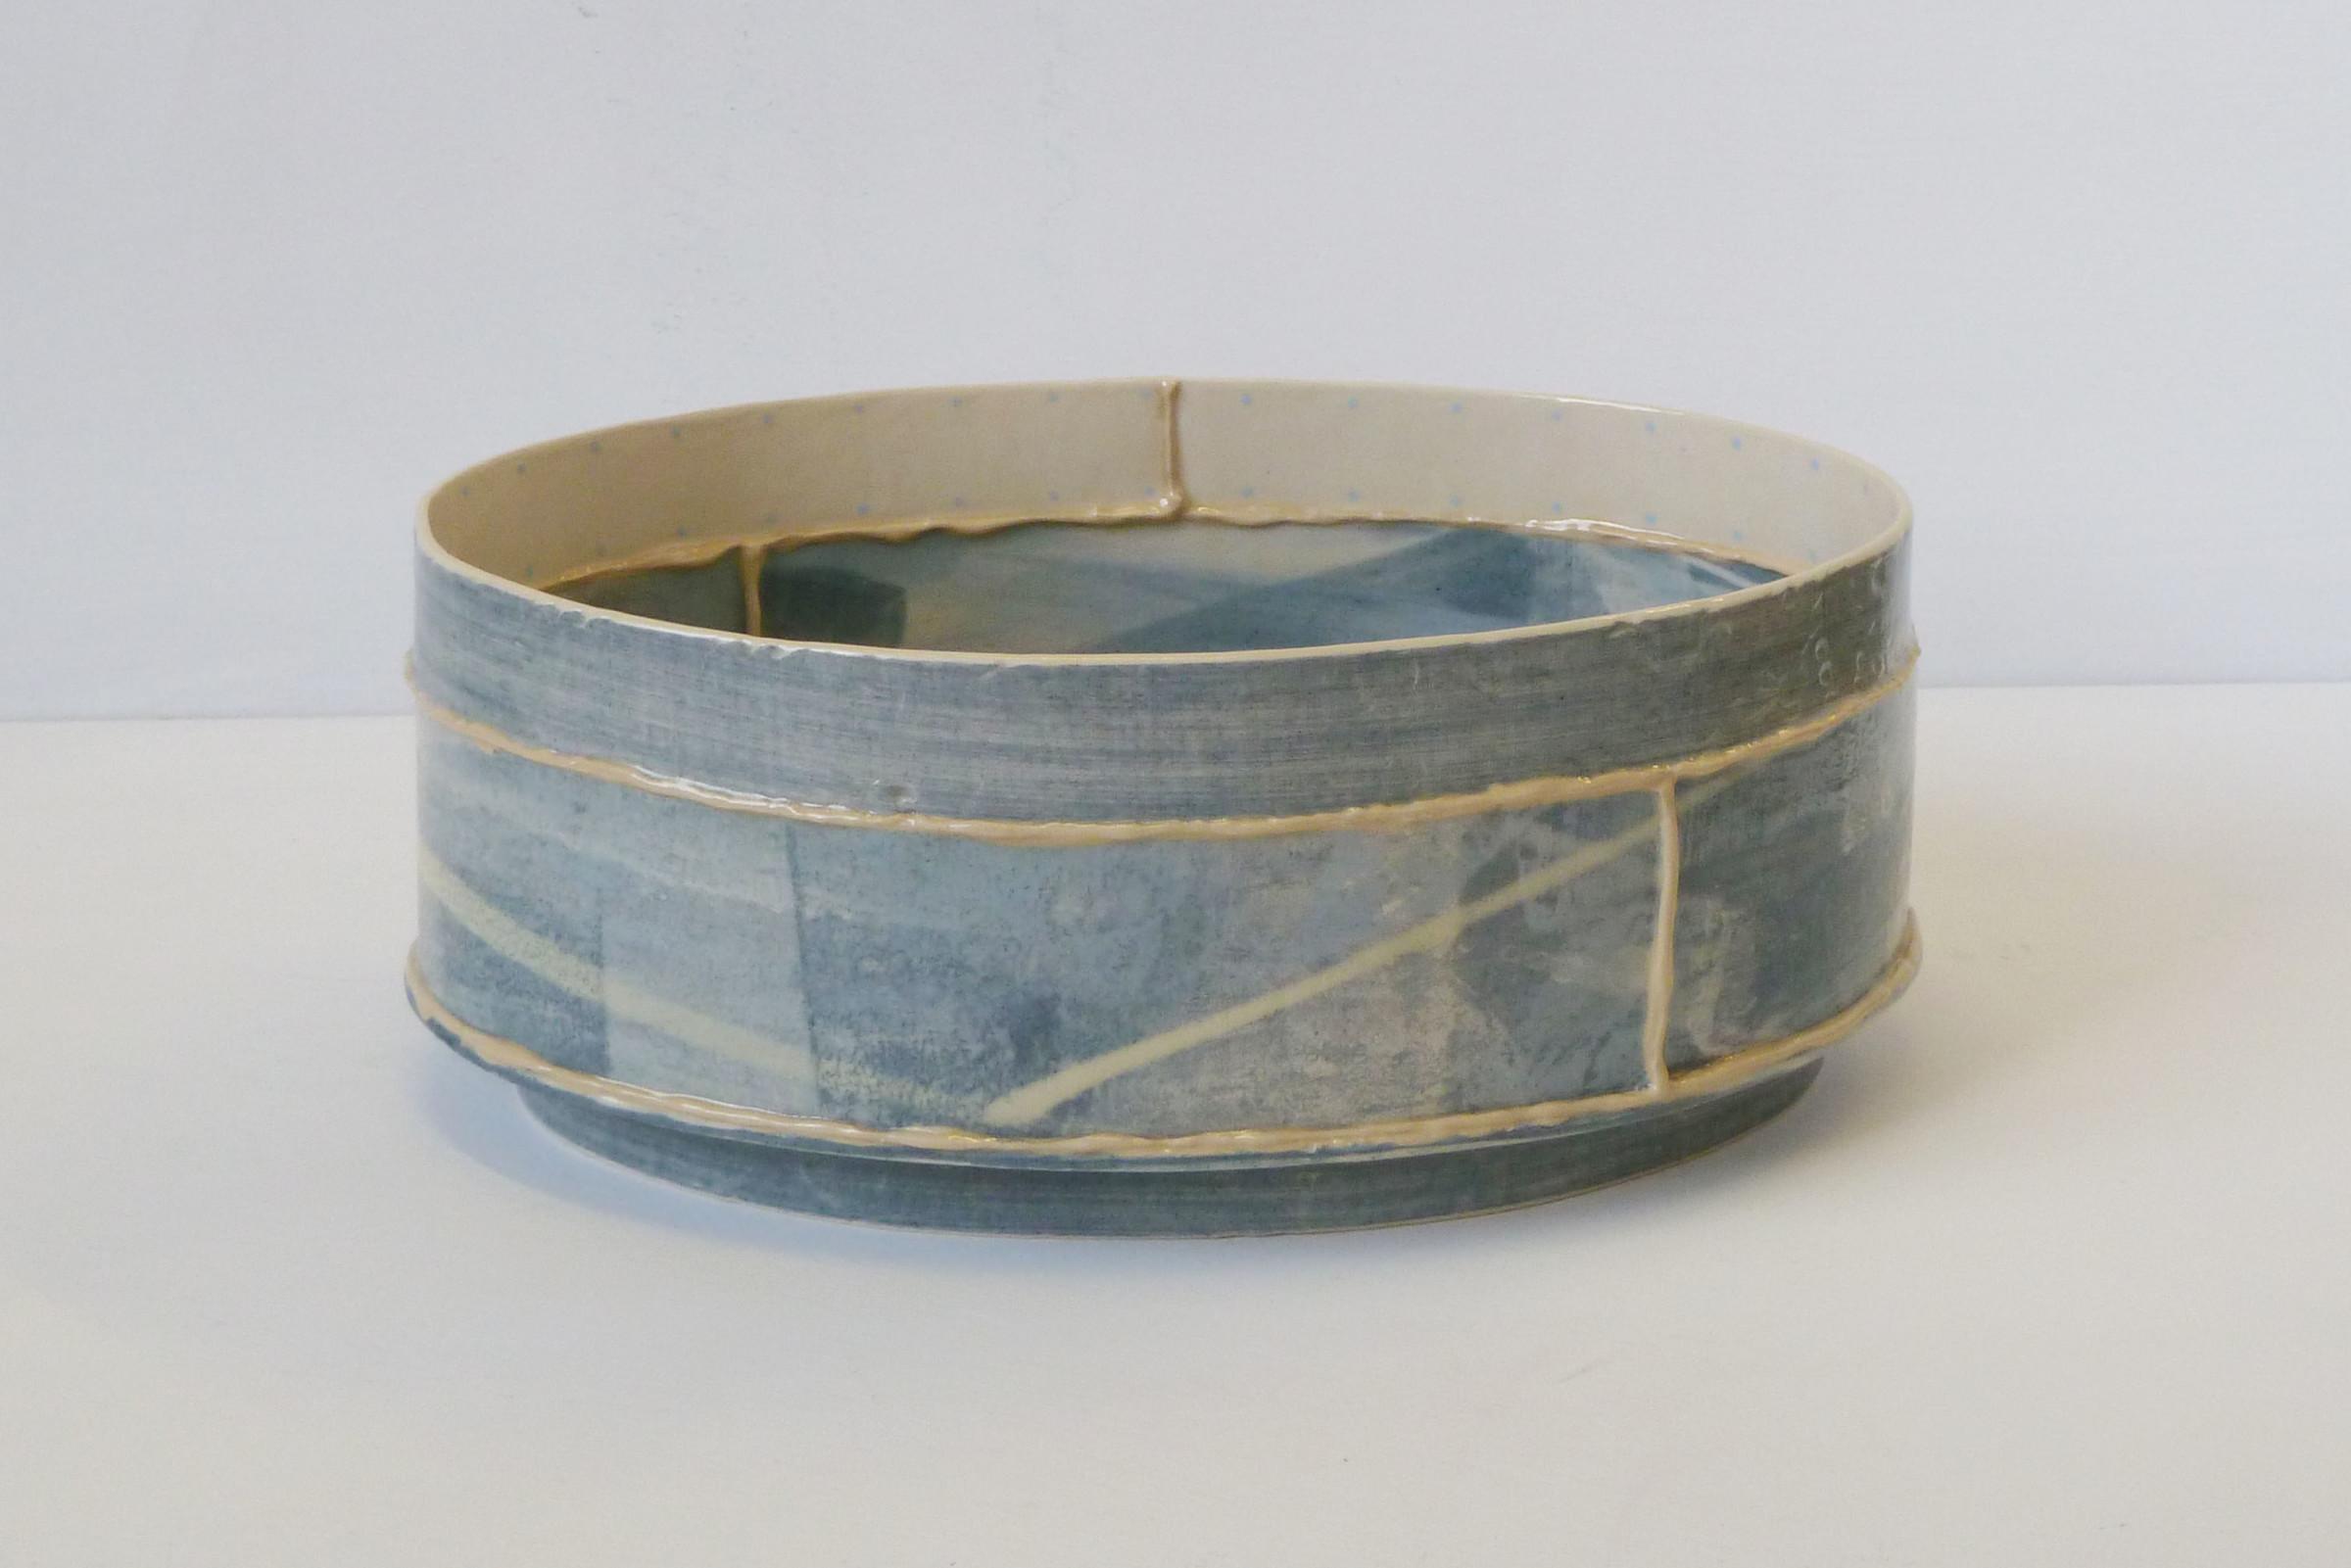 <span class=&#34;link fancybox-details-link&#34;><a href=&#34;/artists/157-emily-kriste-wilcox/works/3951-emily-kriste-wilcox-short-oval-vessel-navy-print-with-yellow-2017/&#34;>View Detail Page</a></span><div class=&#34;artist&#34;><strong>Emily-Kriste Wilcox</strong></div> <div class=&#34;title&#34;><em>Short Oval Vessel, Navy Print with Yellow</em>, 2017</div> <div class=&#34;medium&#34;>handbuilt ceramic</div> <div class=&#34;dimensions&#34;>9 x 22 x 17 cm<br /> 3 1/2 x 8 5/8 x 6 3/4 inches</div><div class=&#34;copyright_line&#34;>OwnArt: £ 29 x £ 10 Months, 0% APR</div>